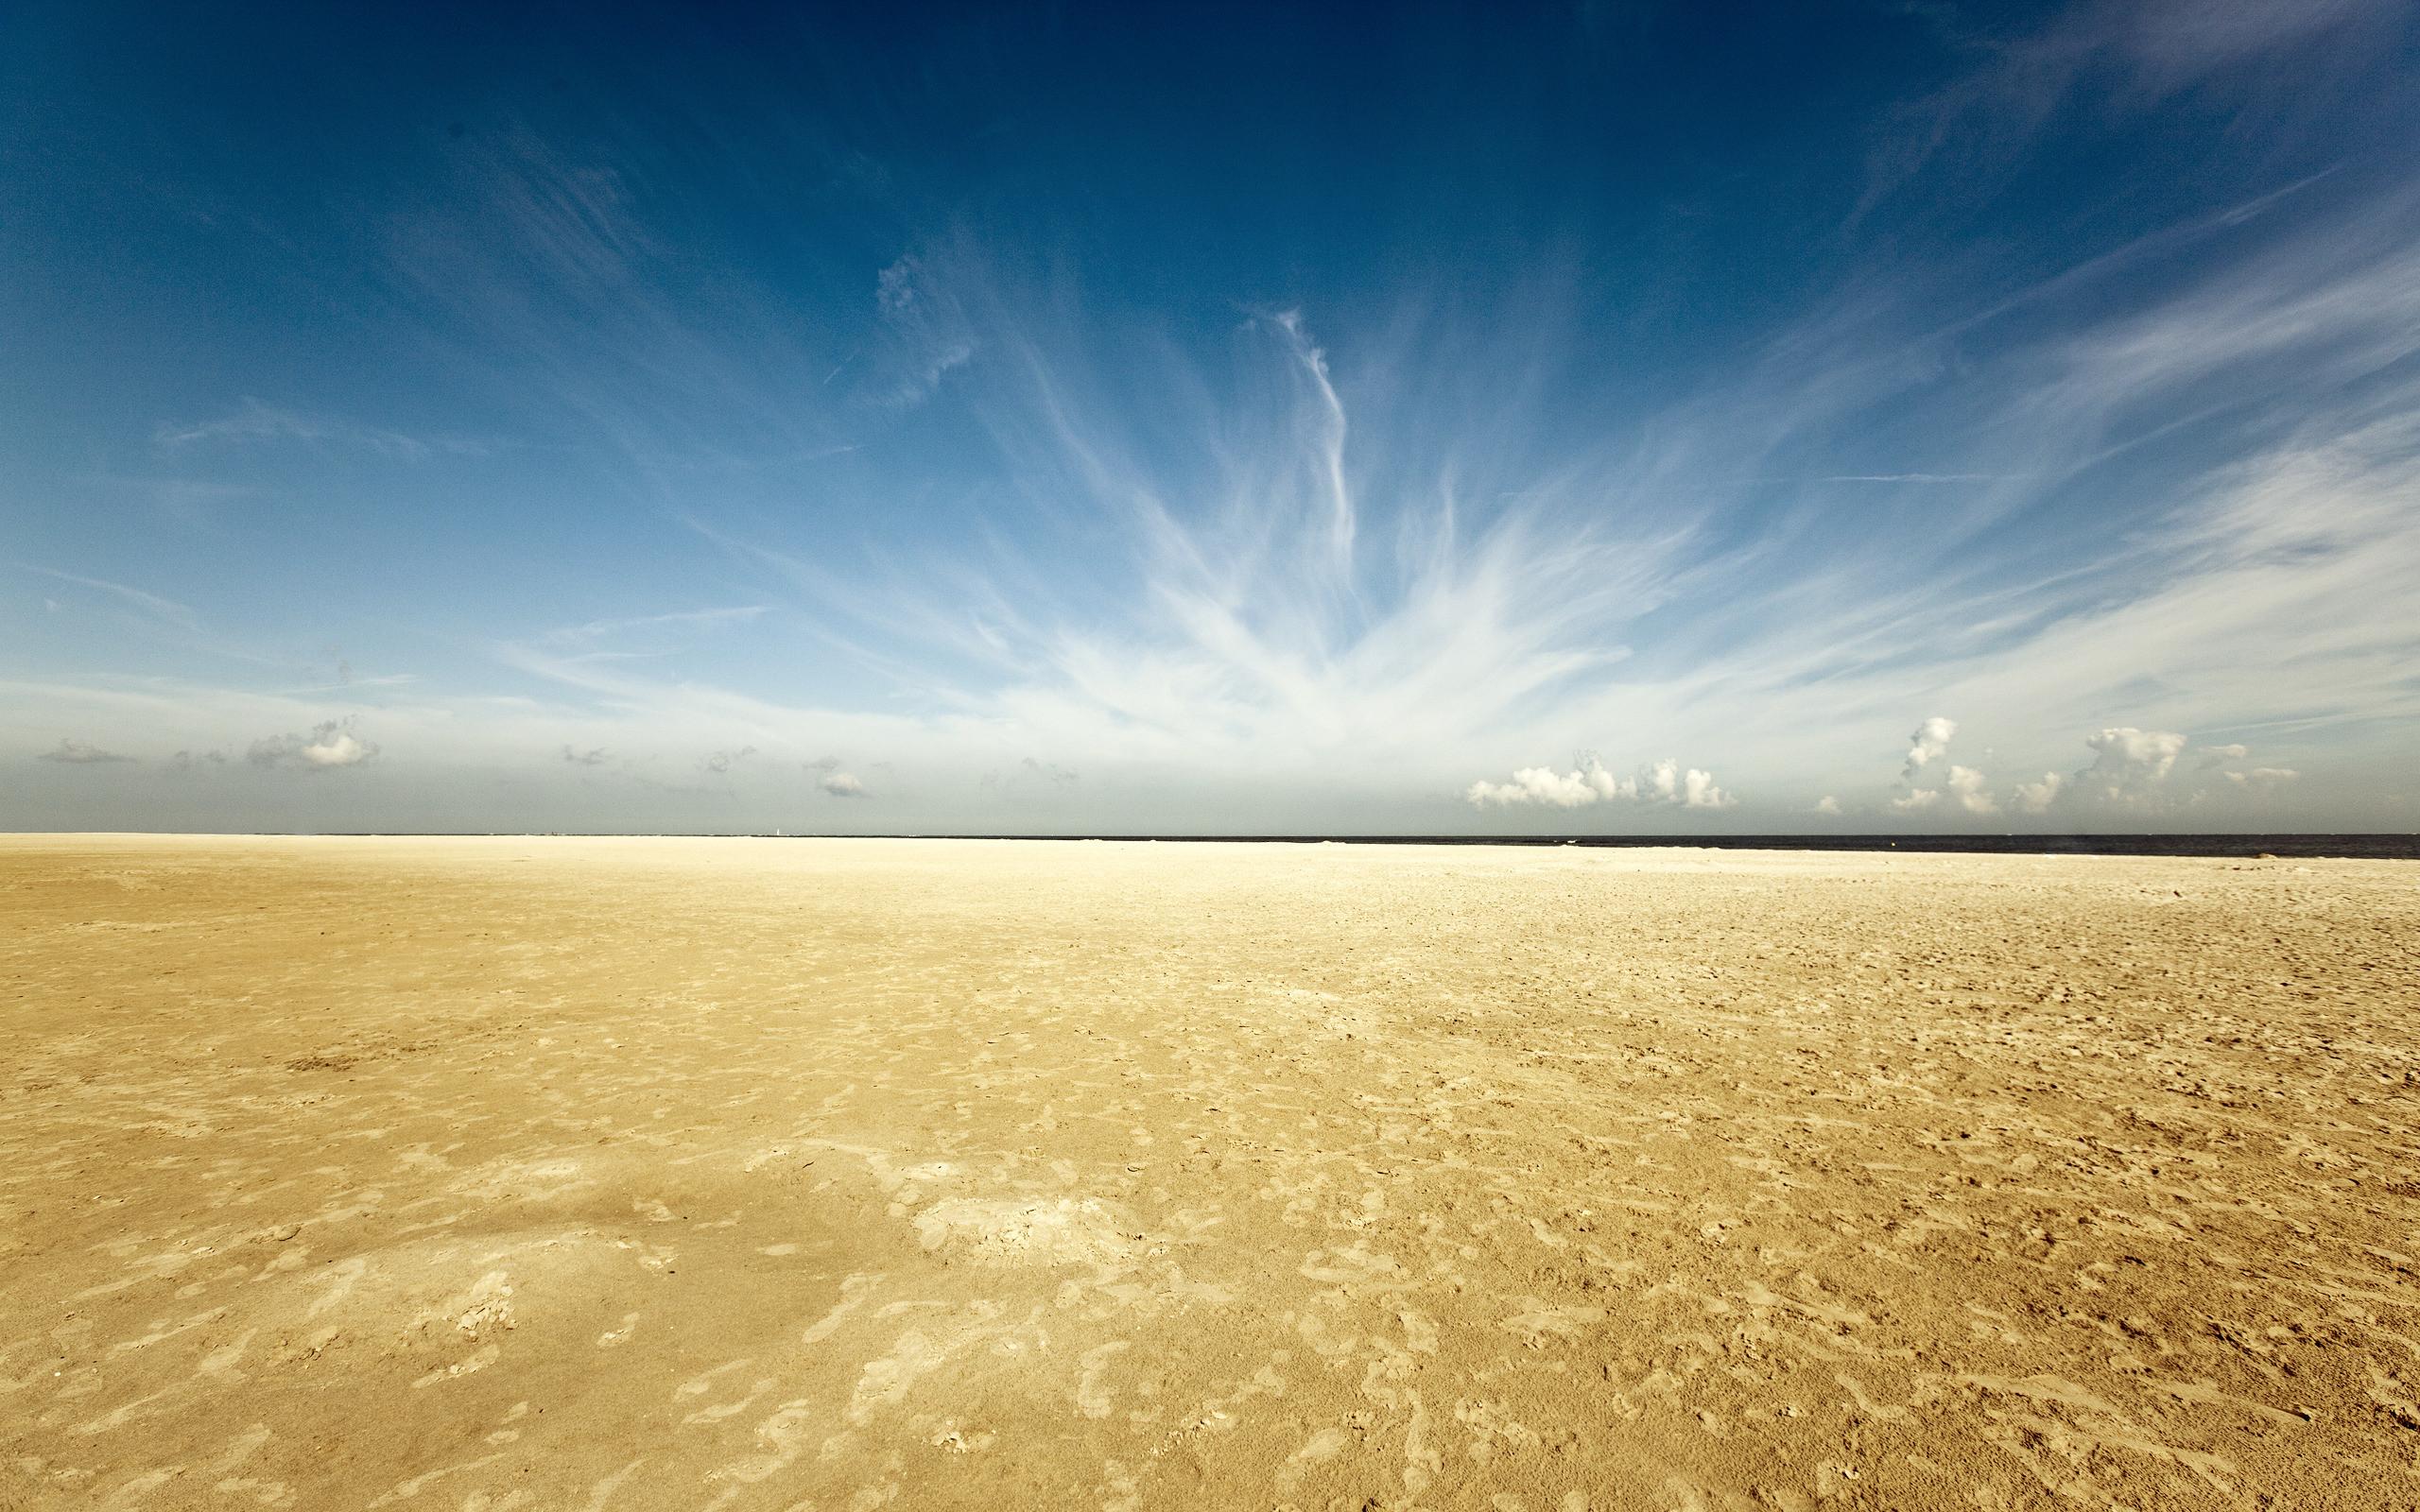 Картинка: Земля, песок, небо, горизонт, облака, пустыня